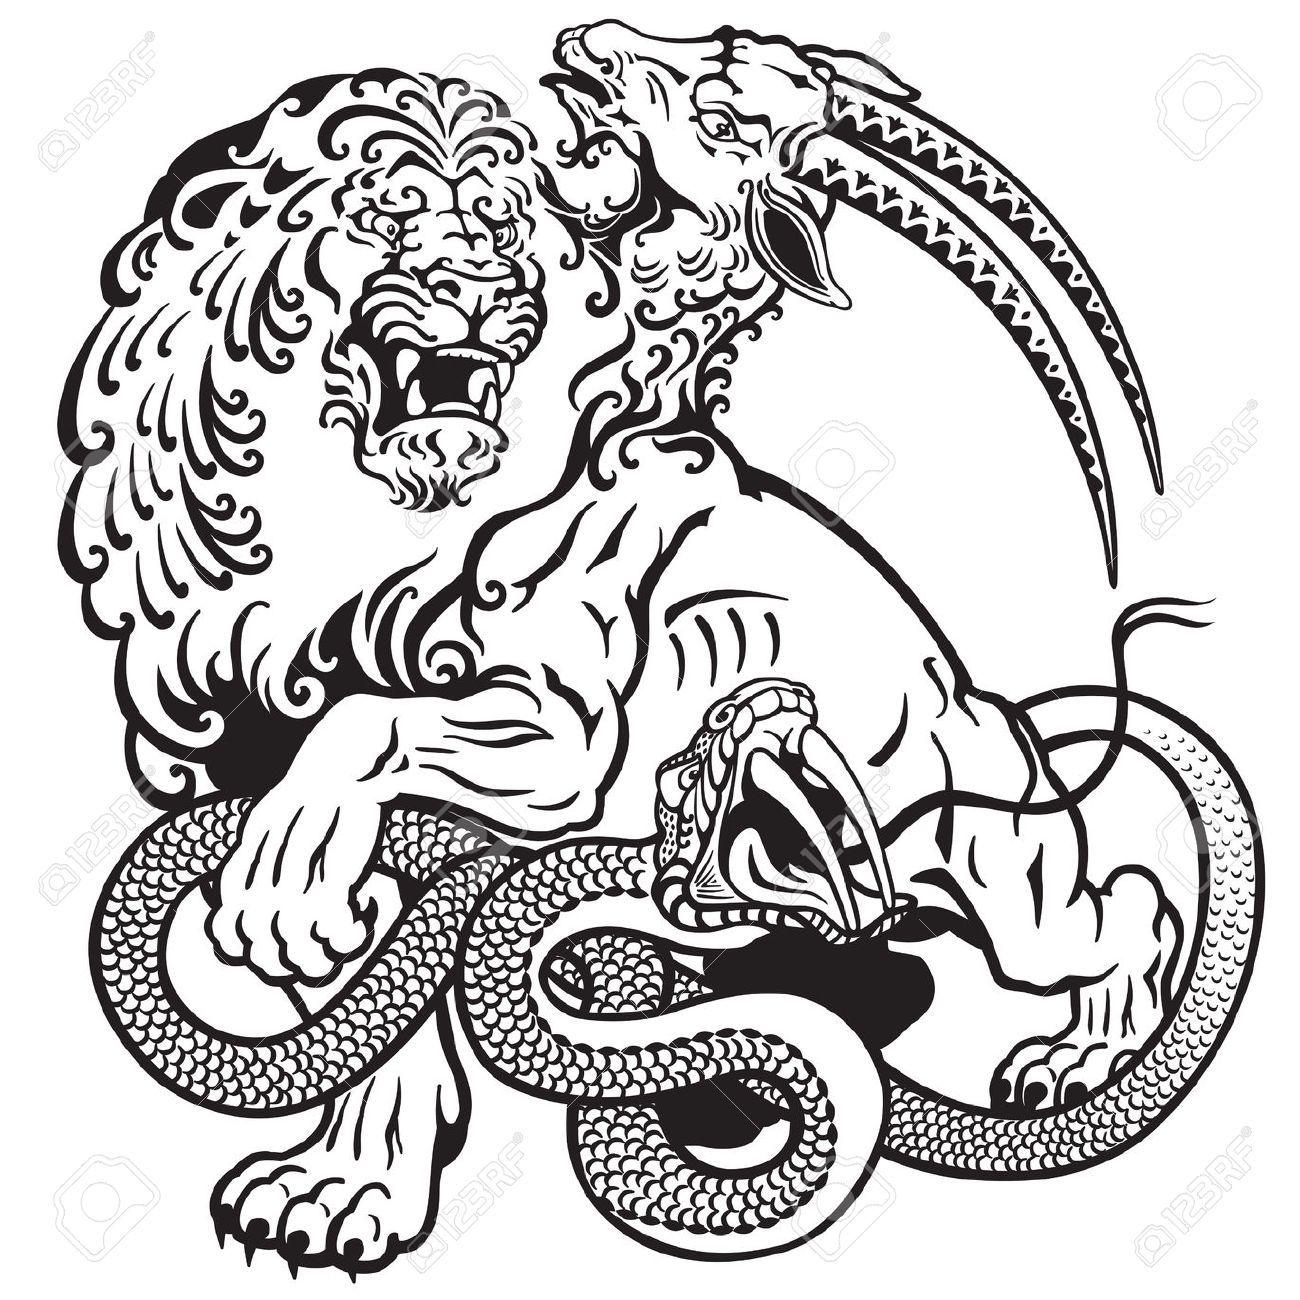 Chimère | Chimère mythologie, Chimère, Mythologie